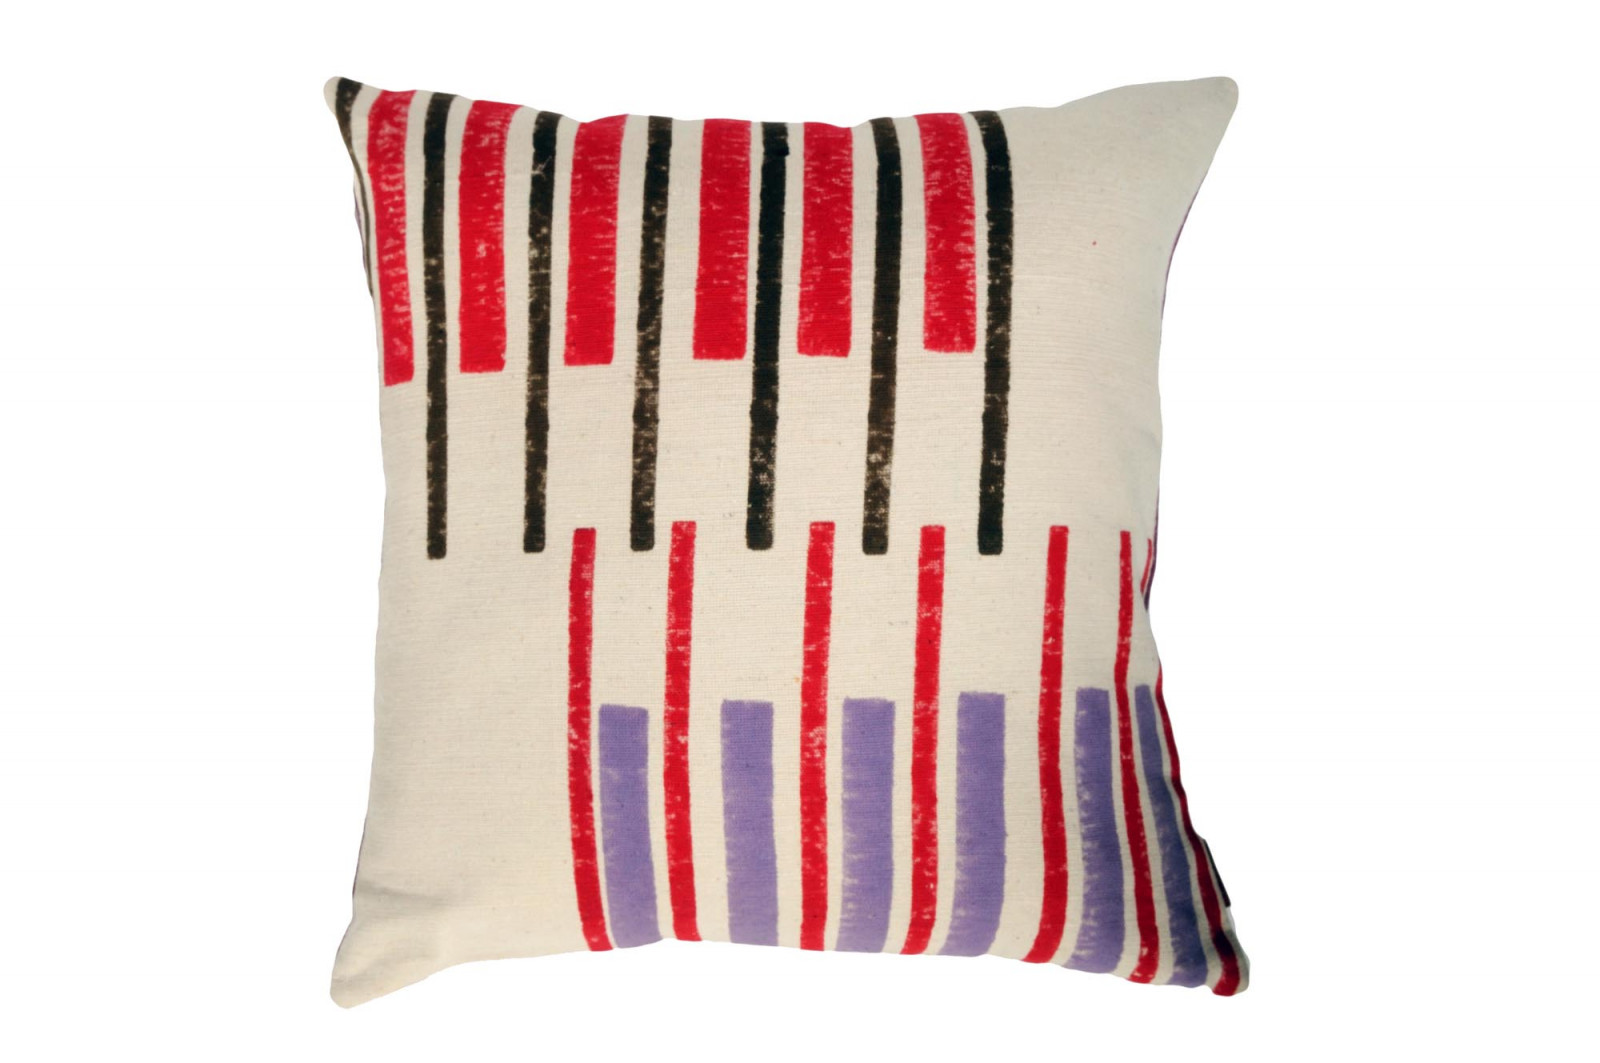 COUSSIN 50x50 CHANDIGARH / grenadine stripes